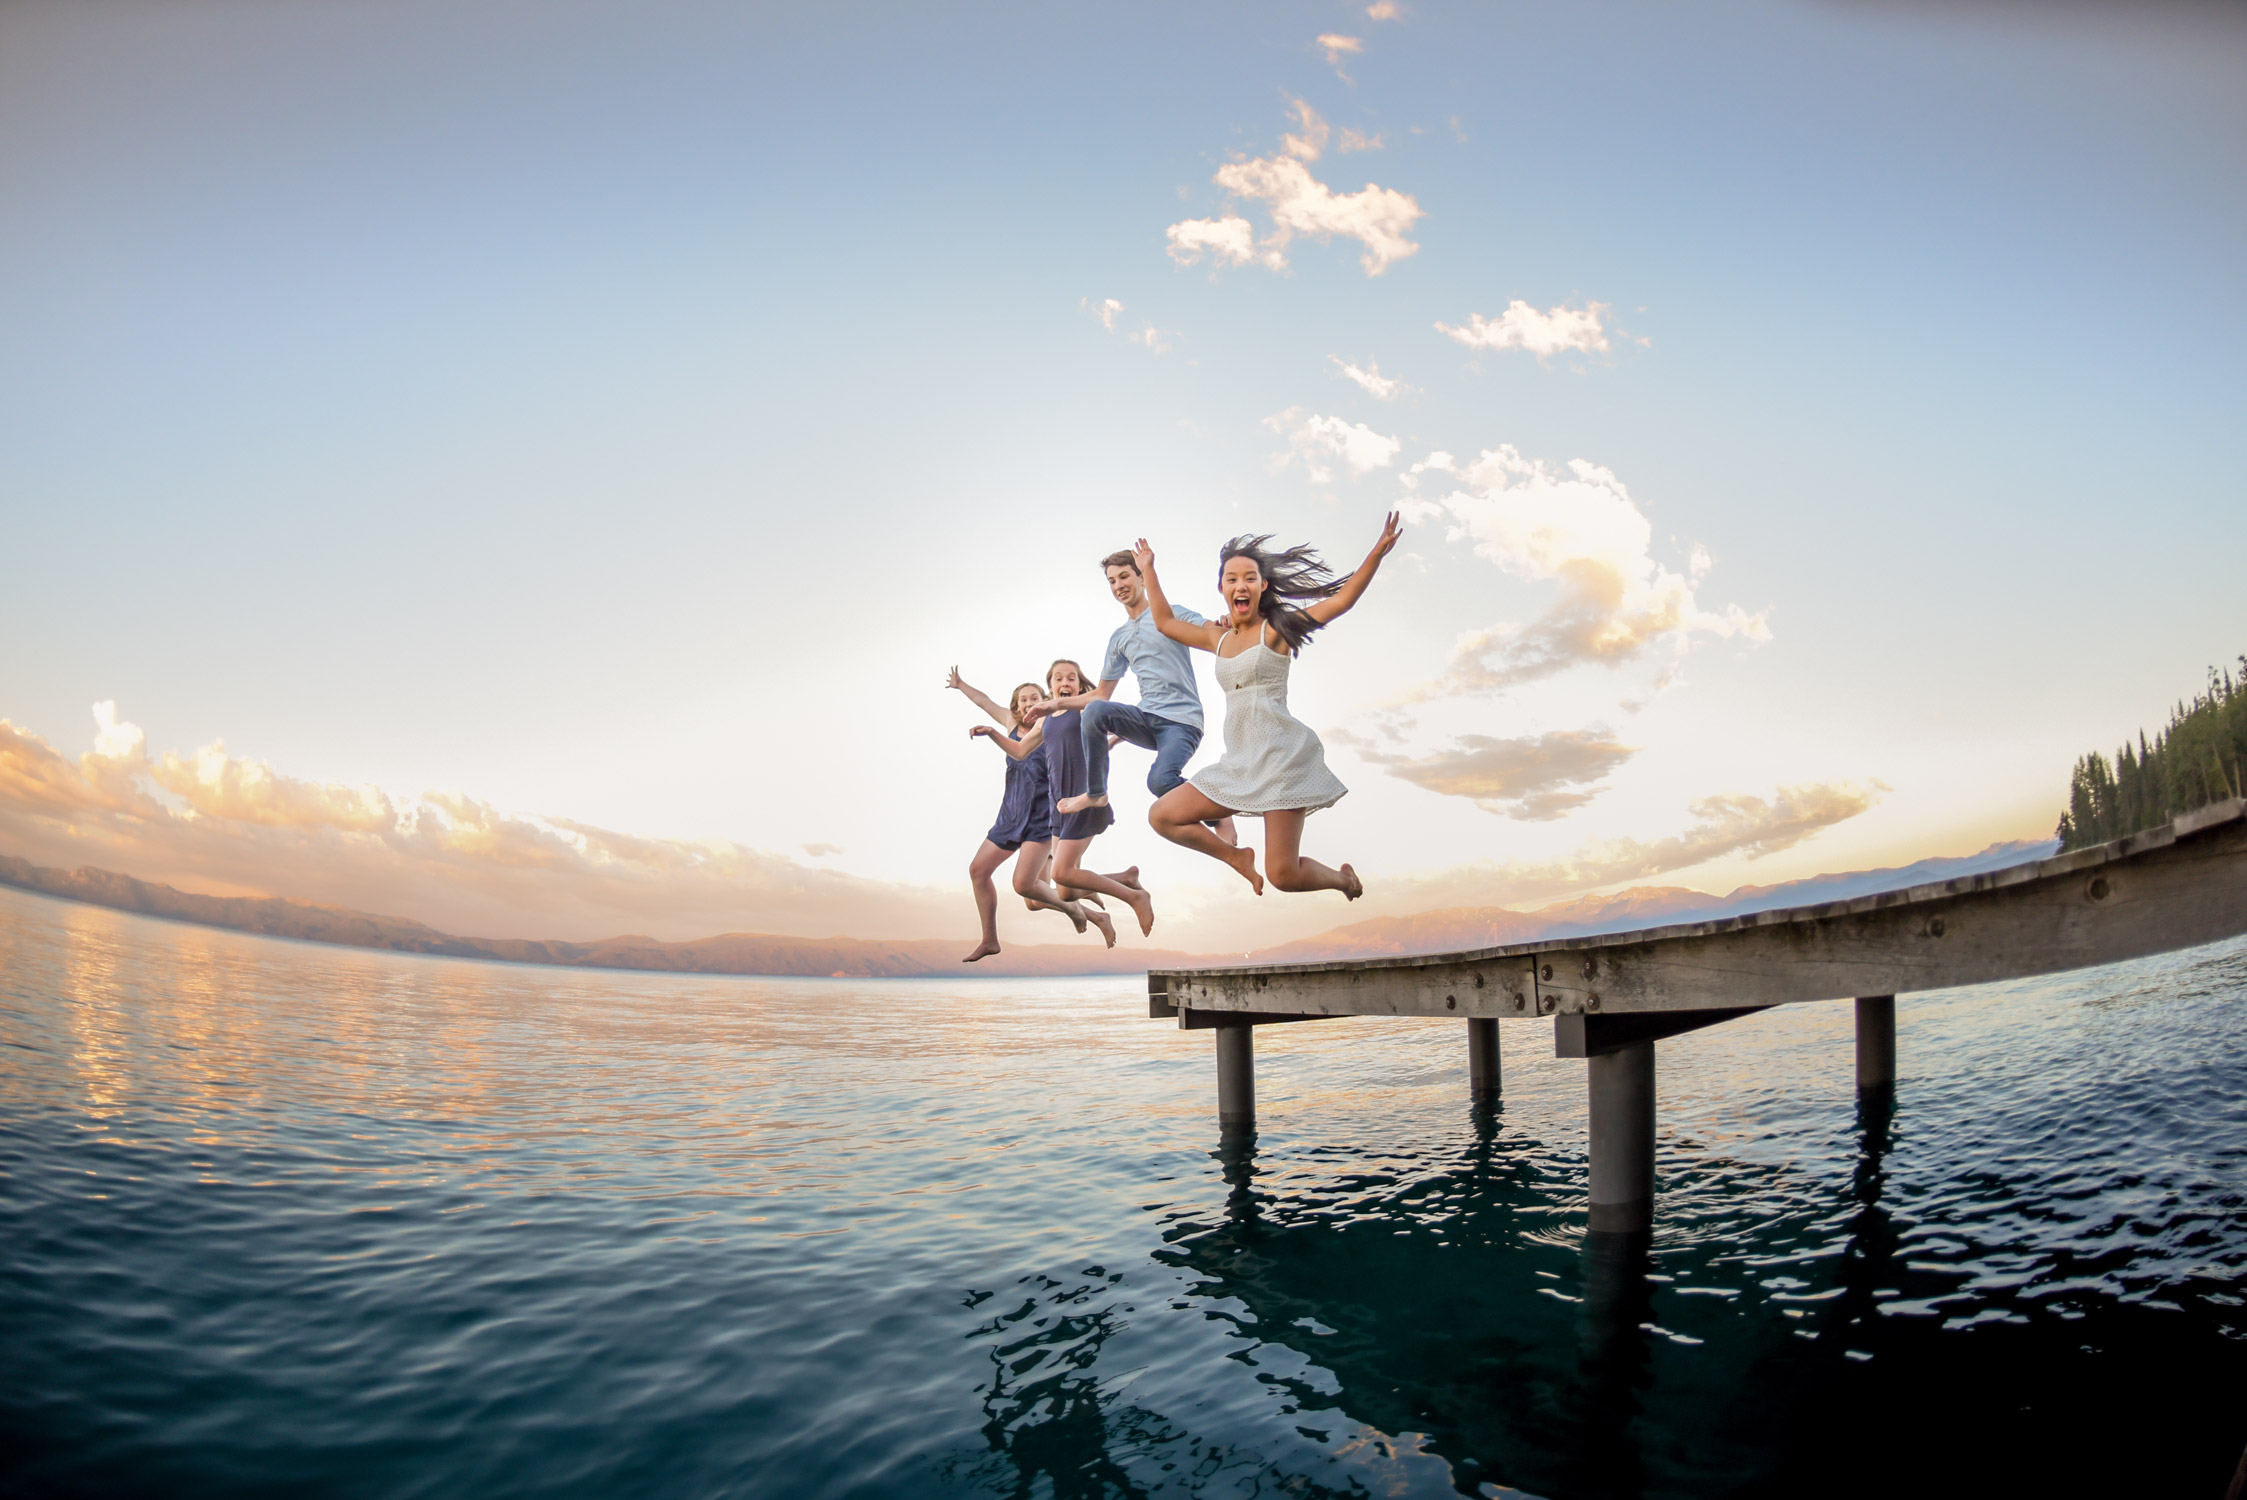 dock jumping photos tahoe